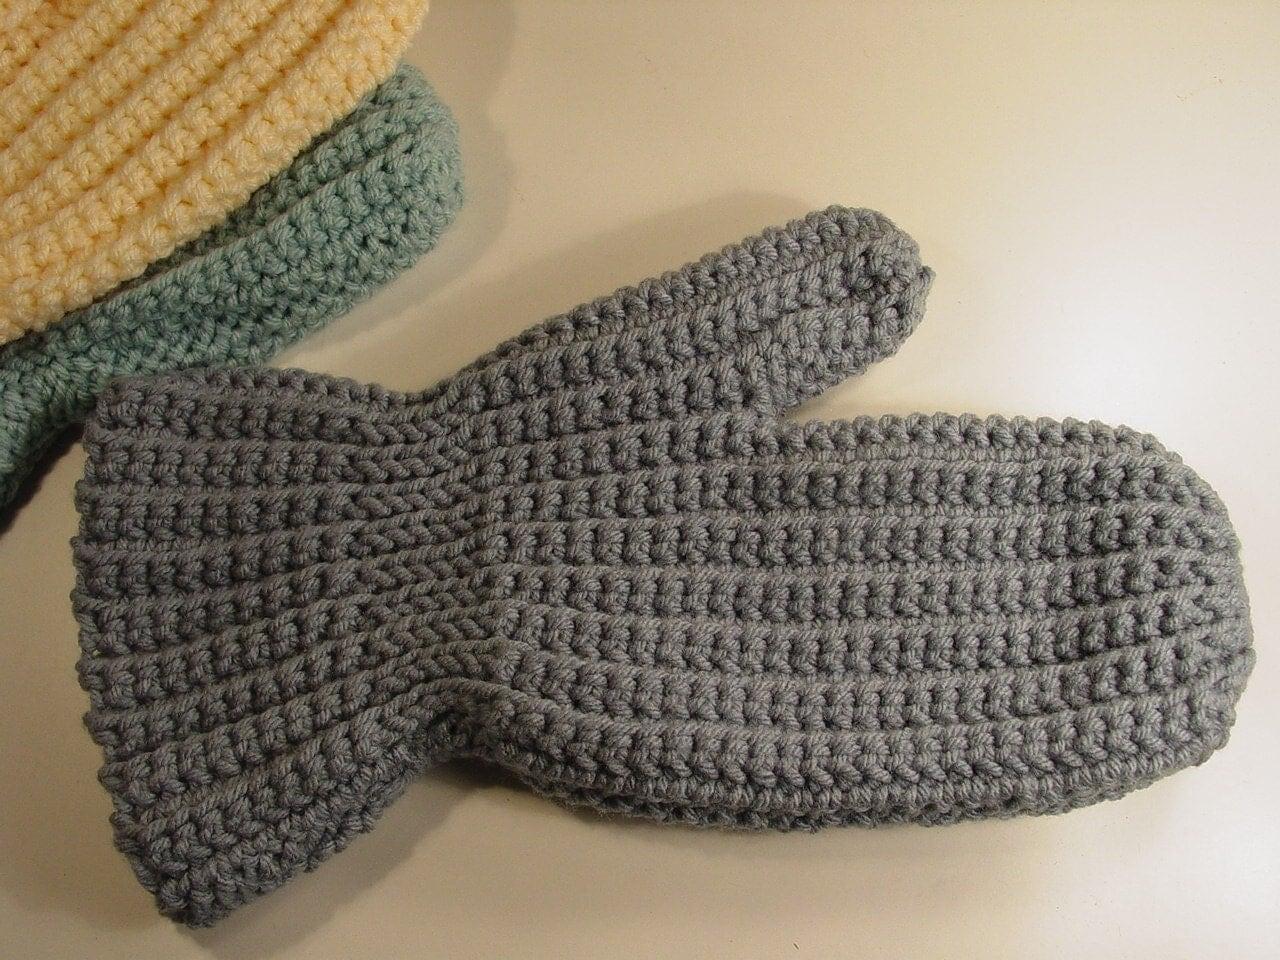 Free printable crochet patterns for fingerless gloves dancox for easy sideways crochet mittens pattern pdf bankloansurffo Images